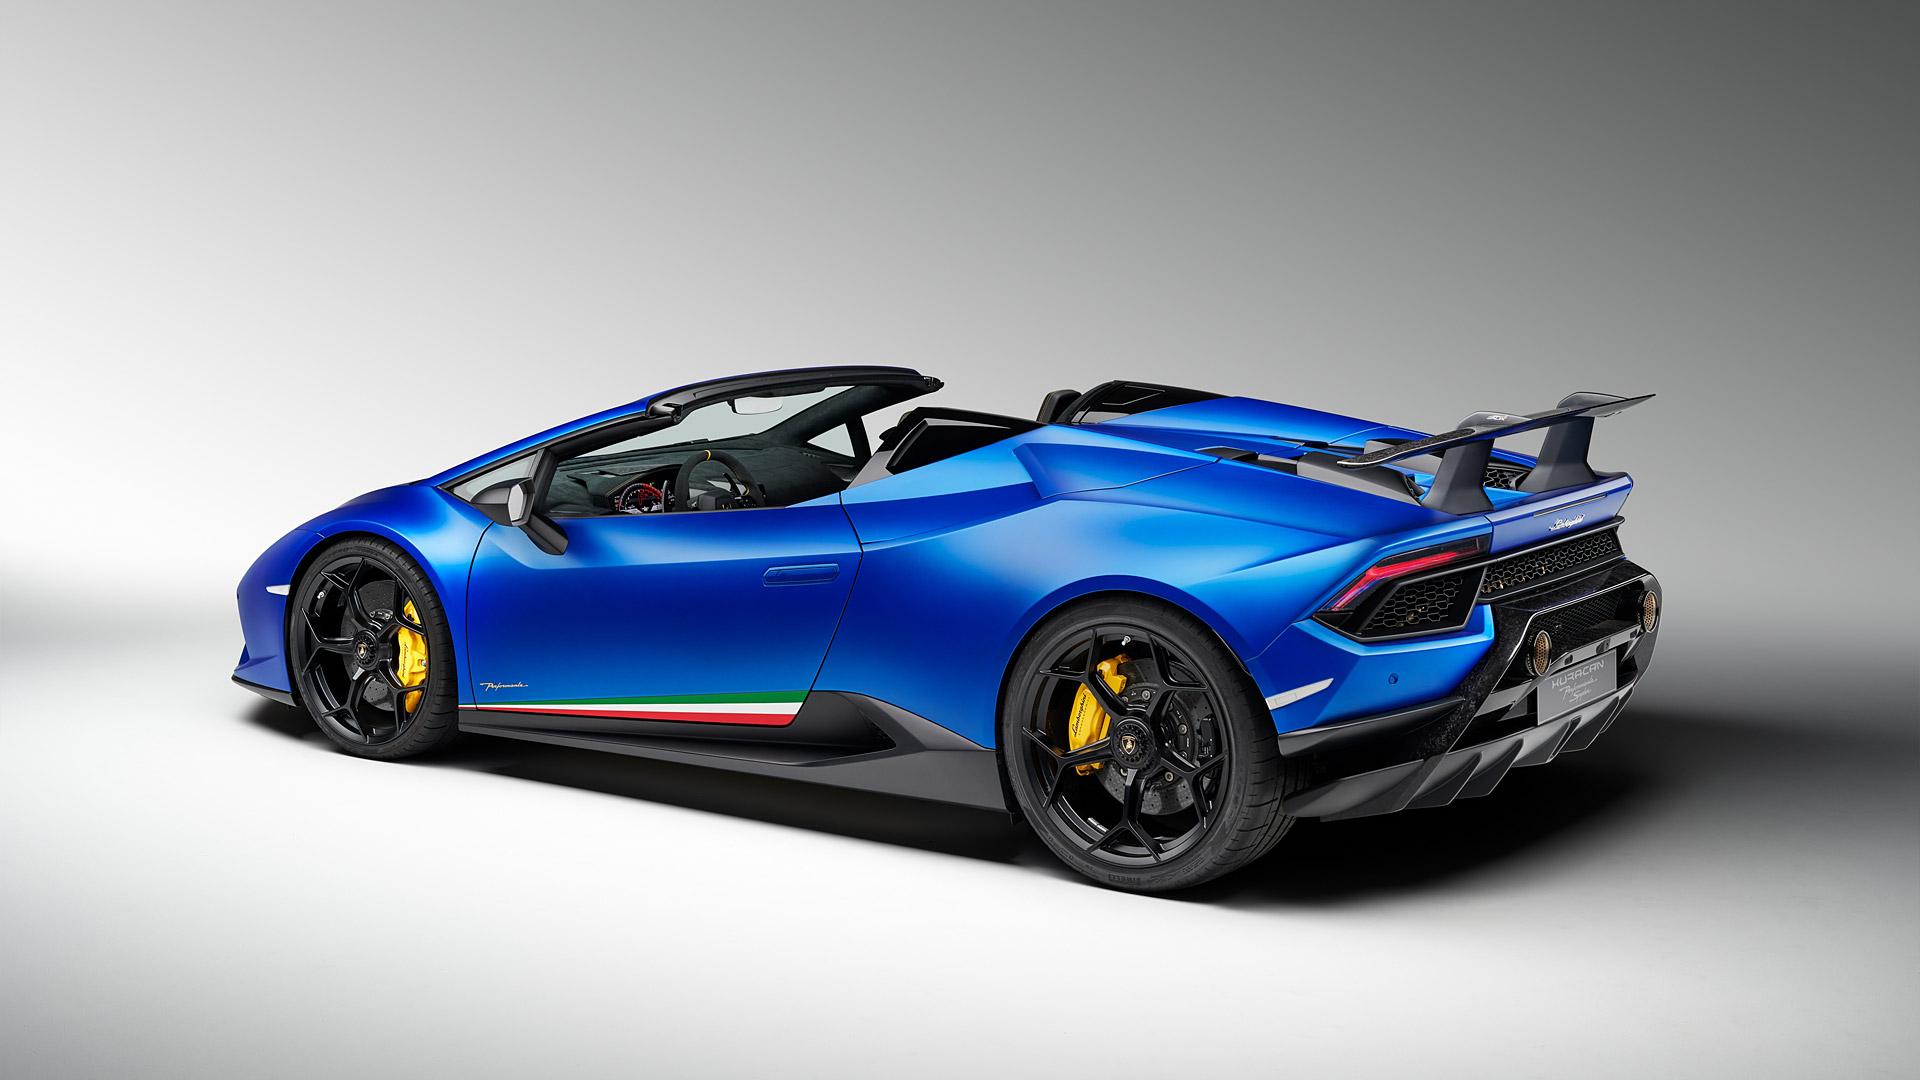 2019 Lamborghini Huracan Performante Lamborghini Cars Review